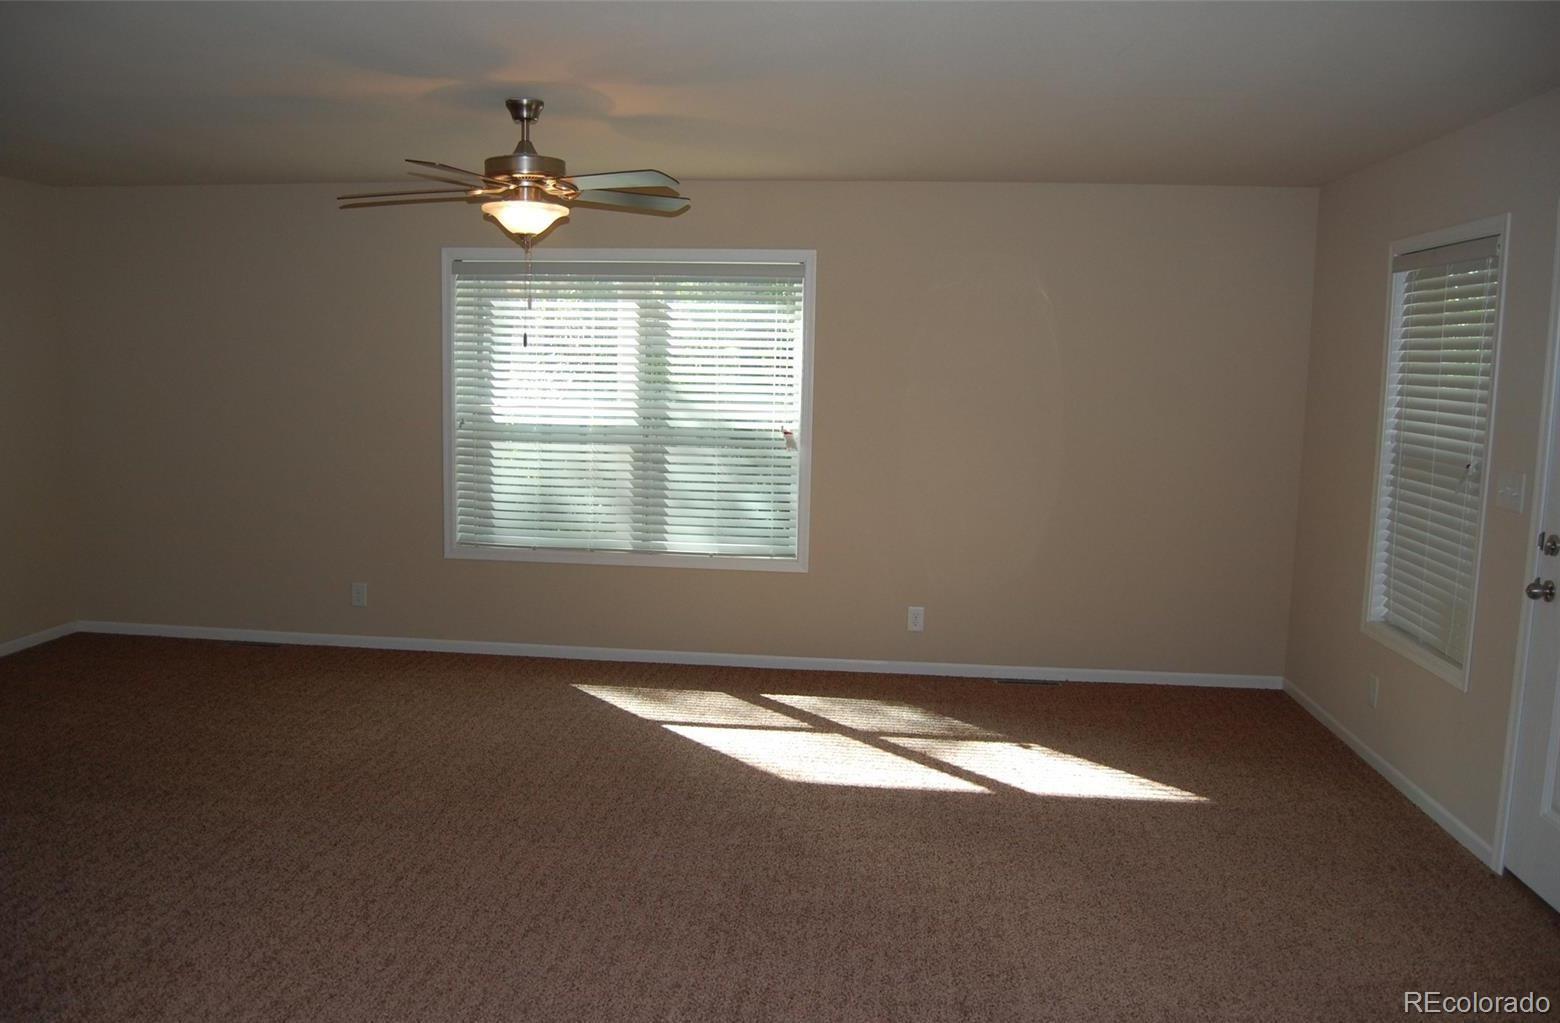 MLS# 9171580 - 8 - 426 Cheyenne Street, Kiowa, CO 80117